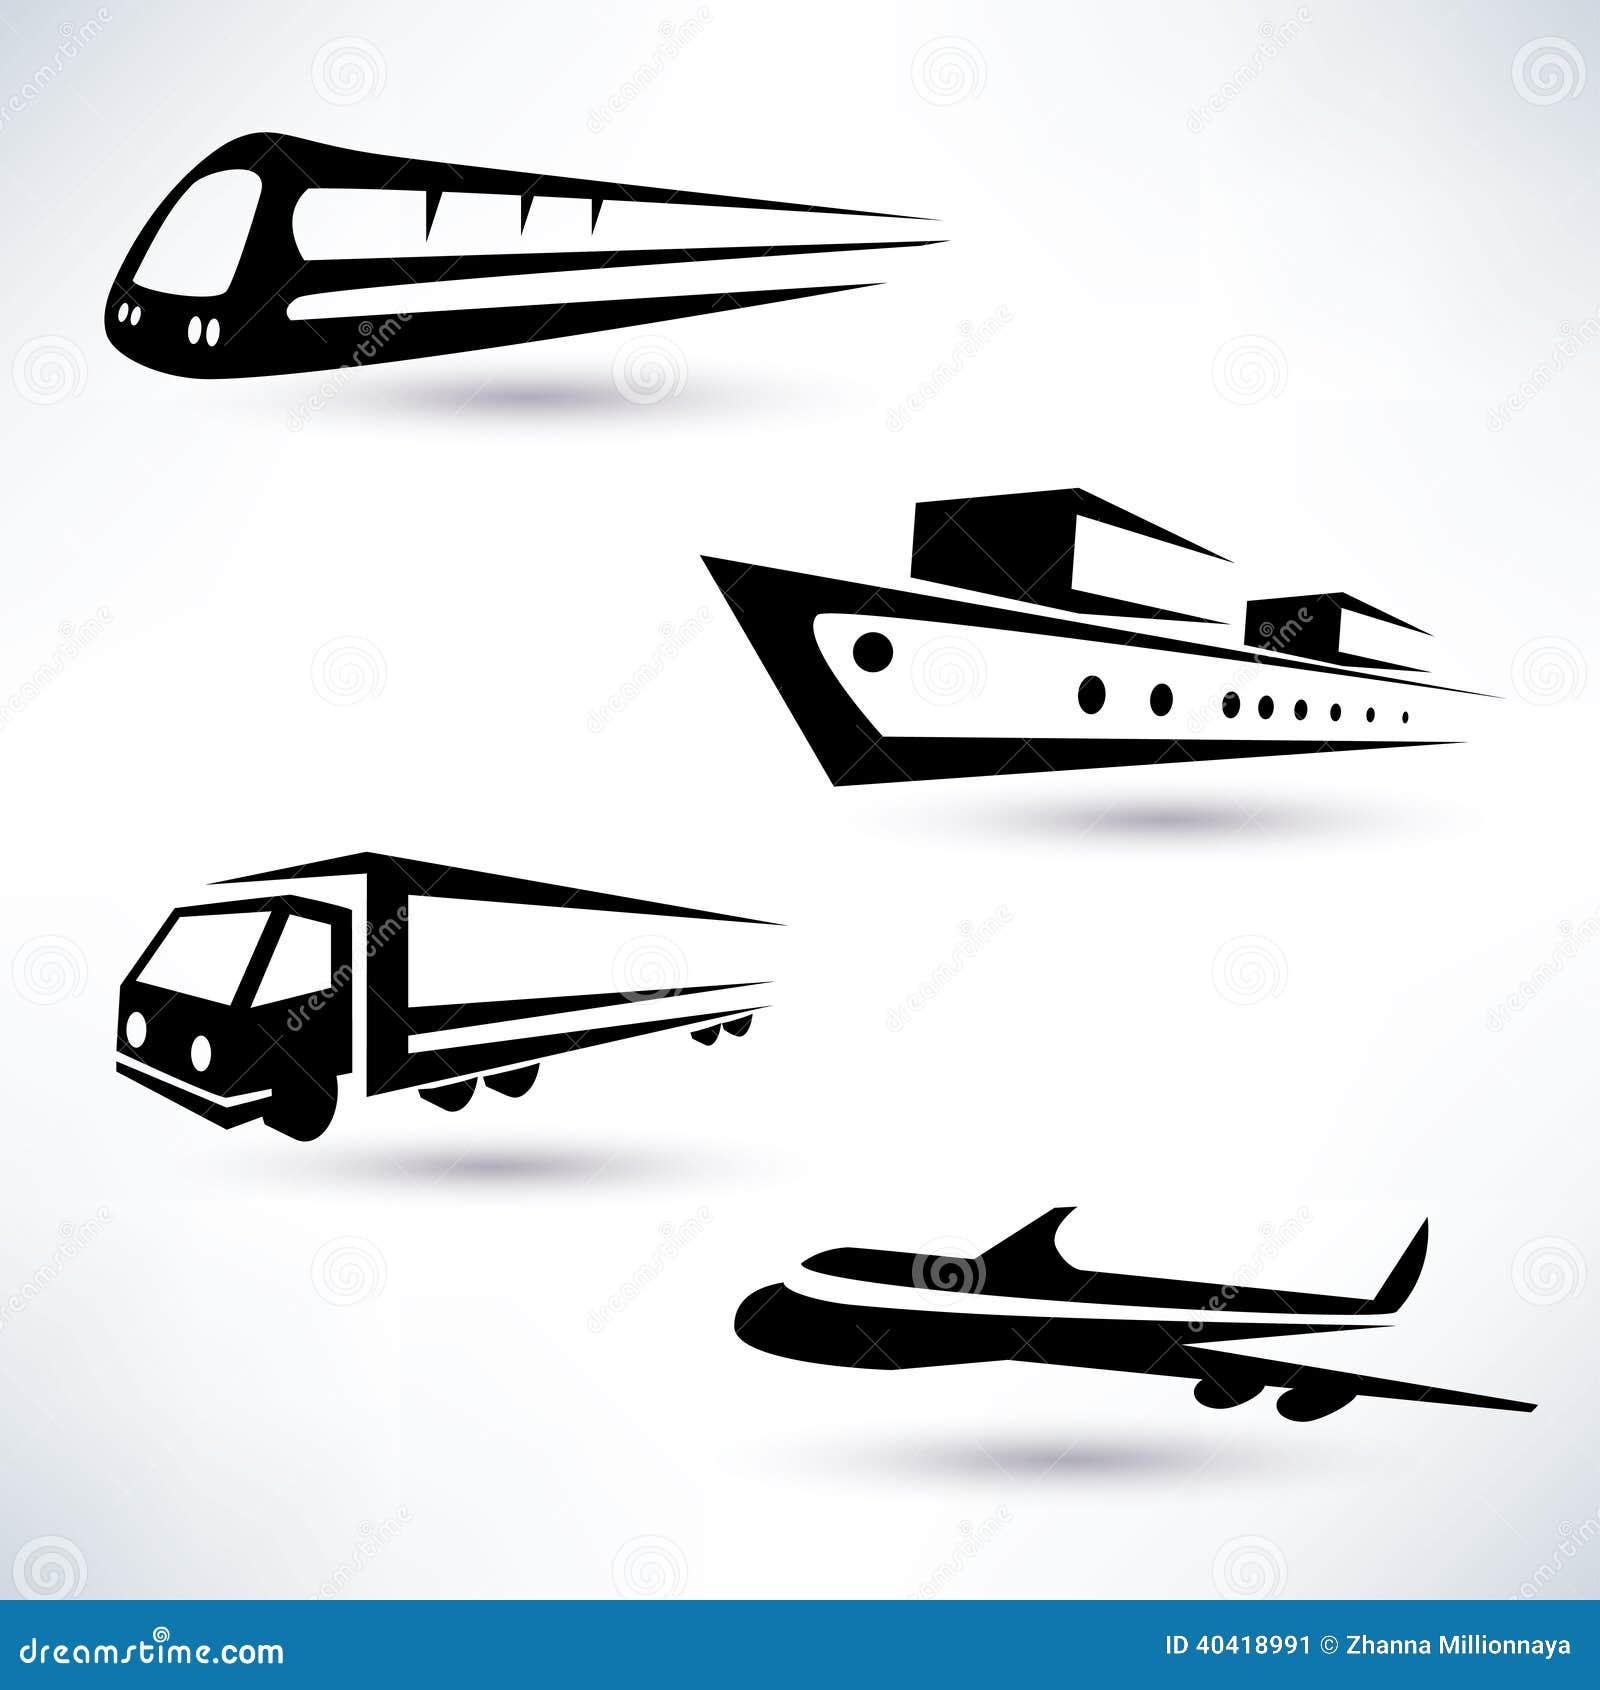 Download Cargo Transportation Icons Set Stock Vector - Illustration of icon, design: 40418991